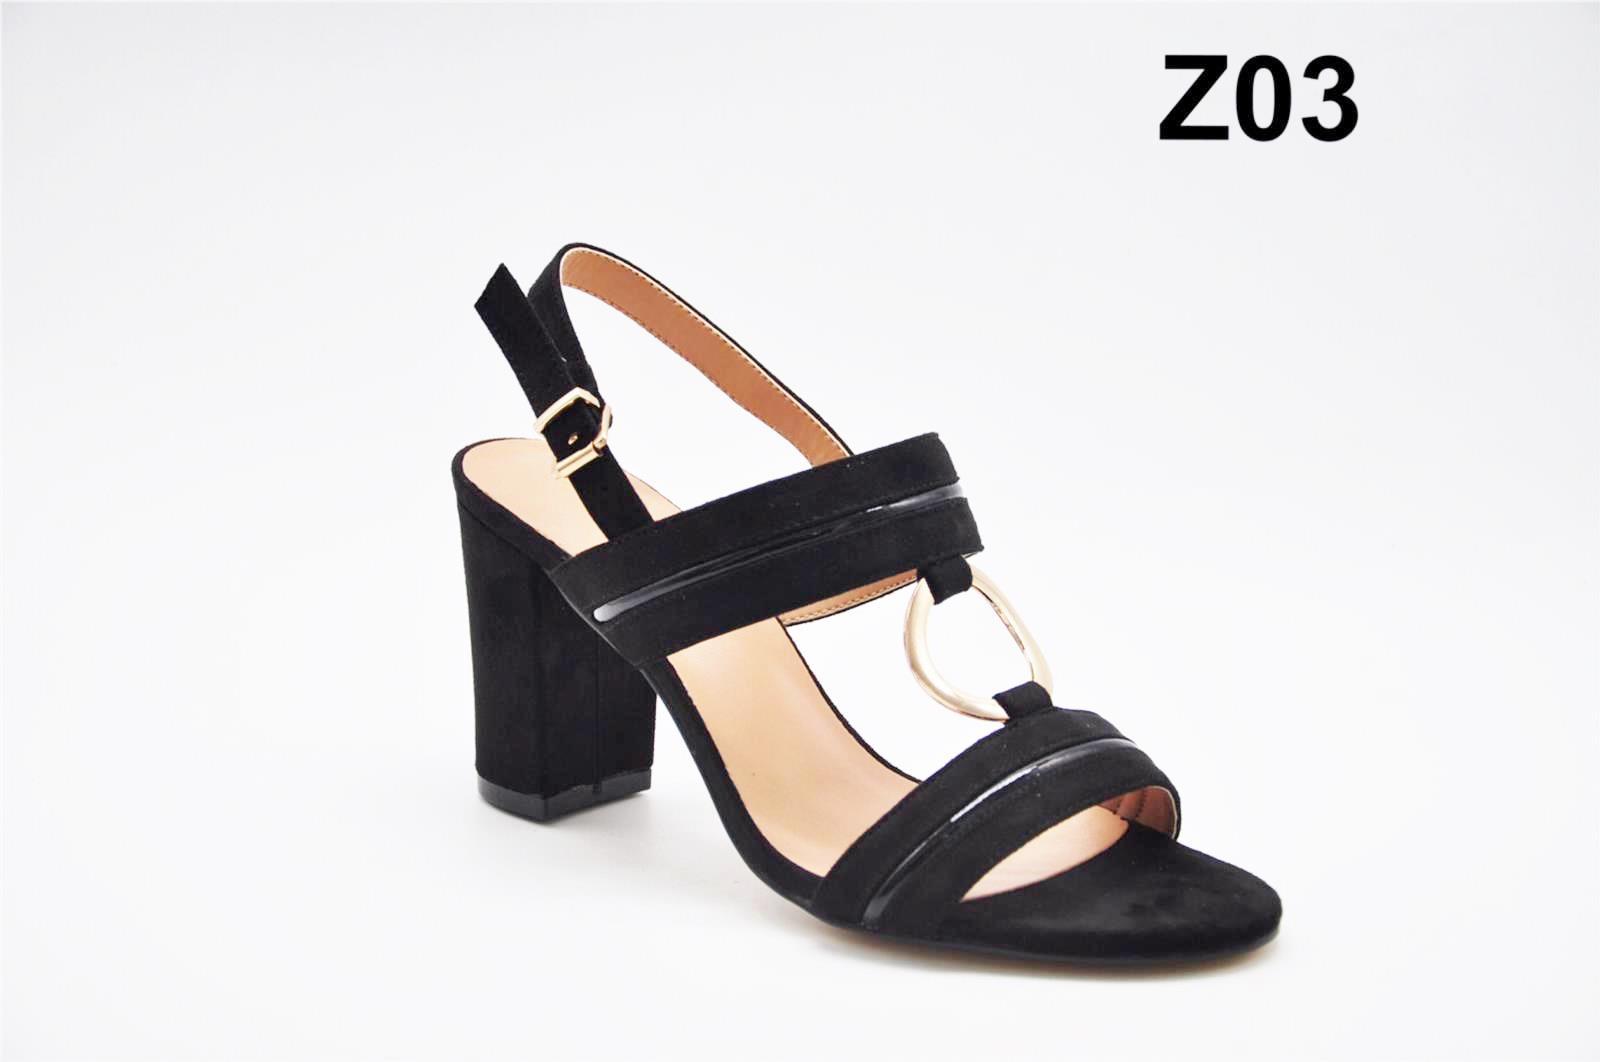 Sandale dama negre Katy